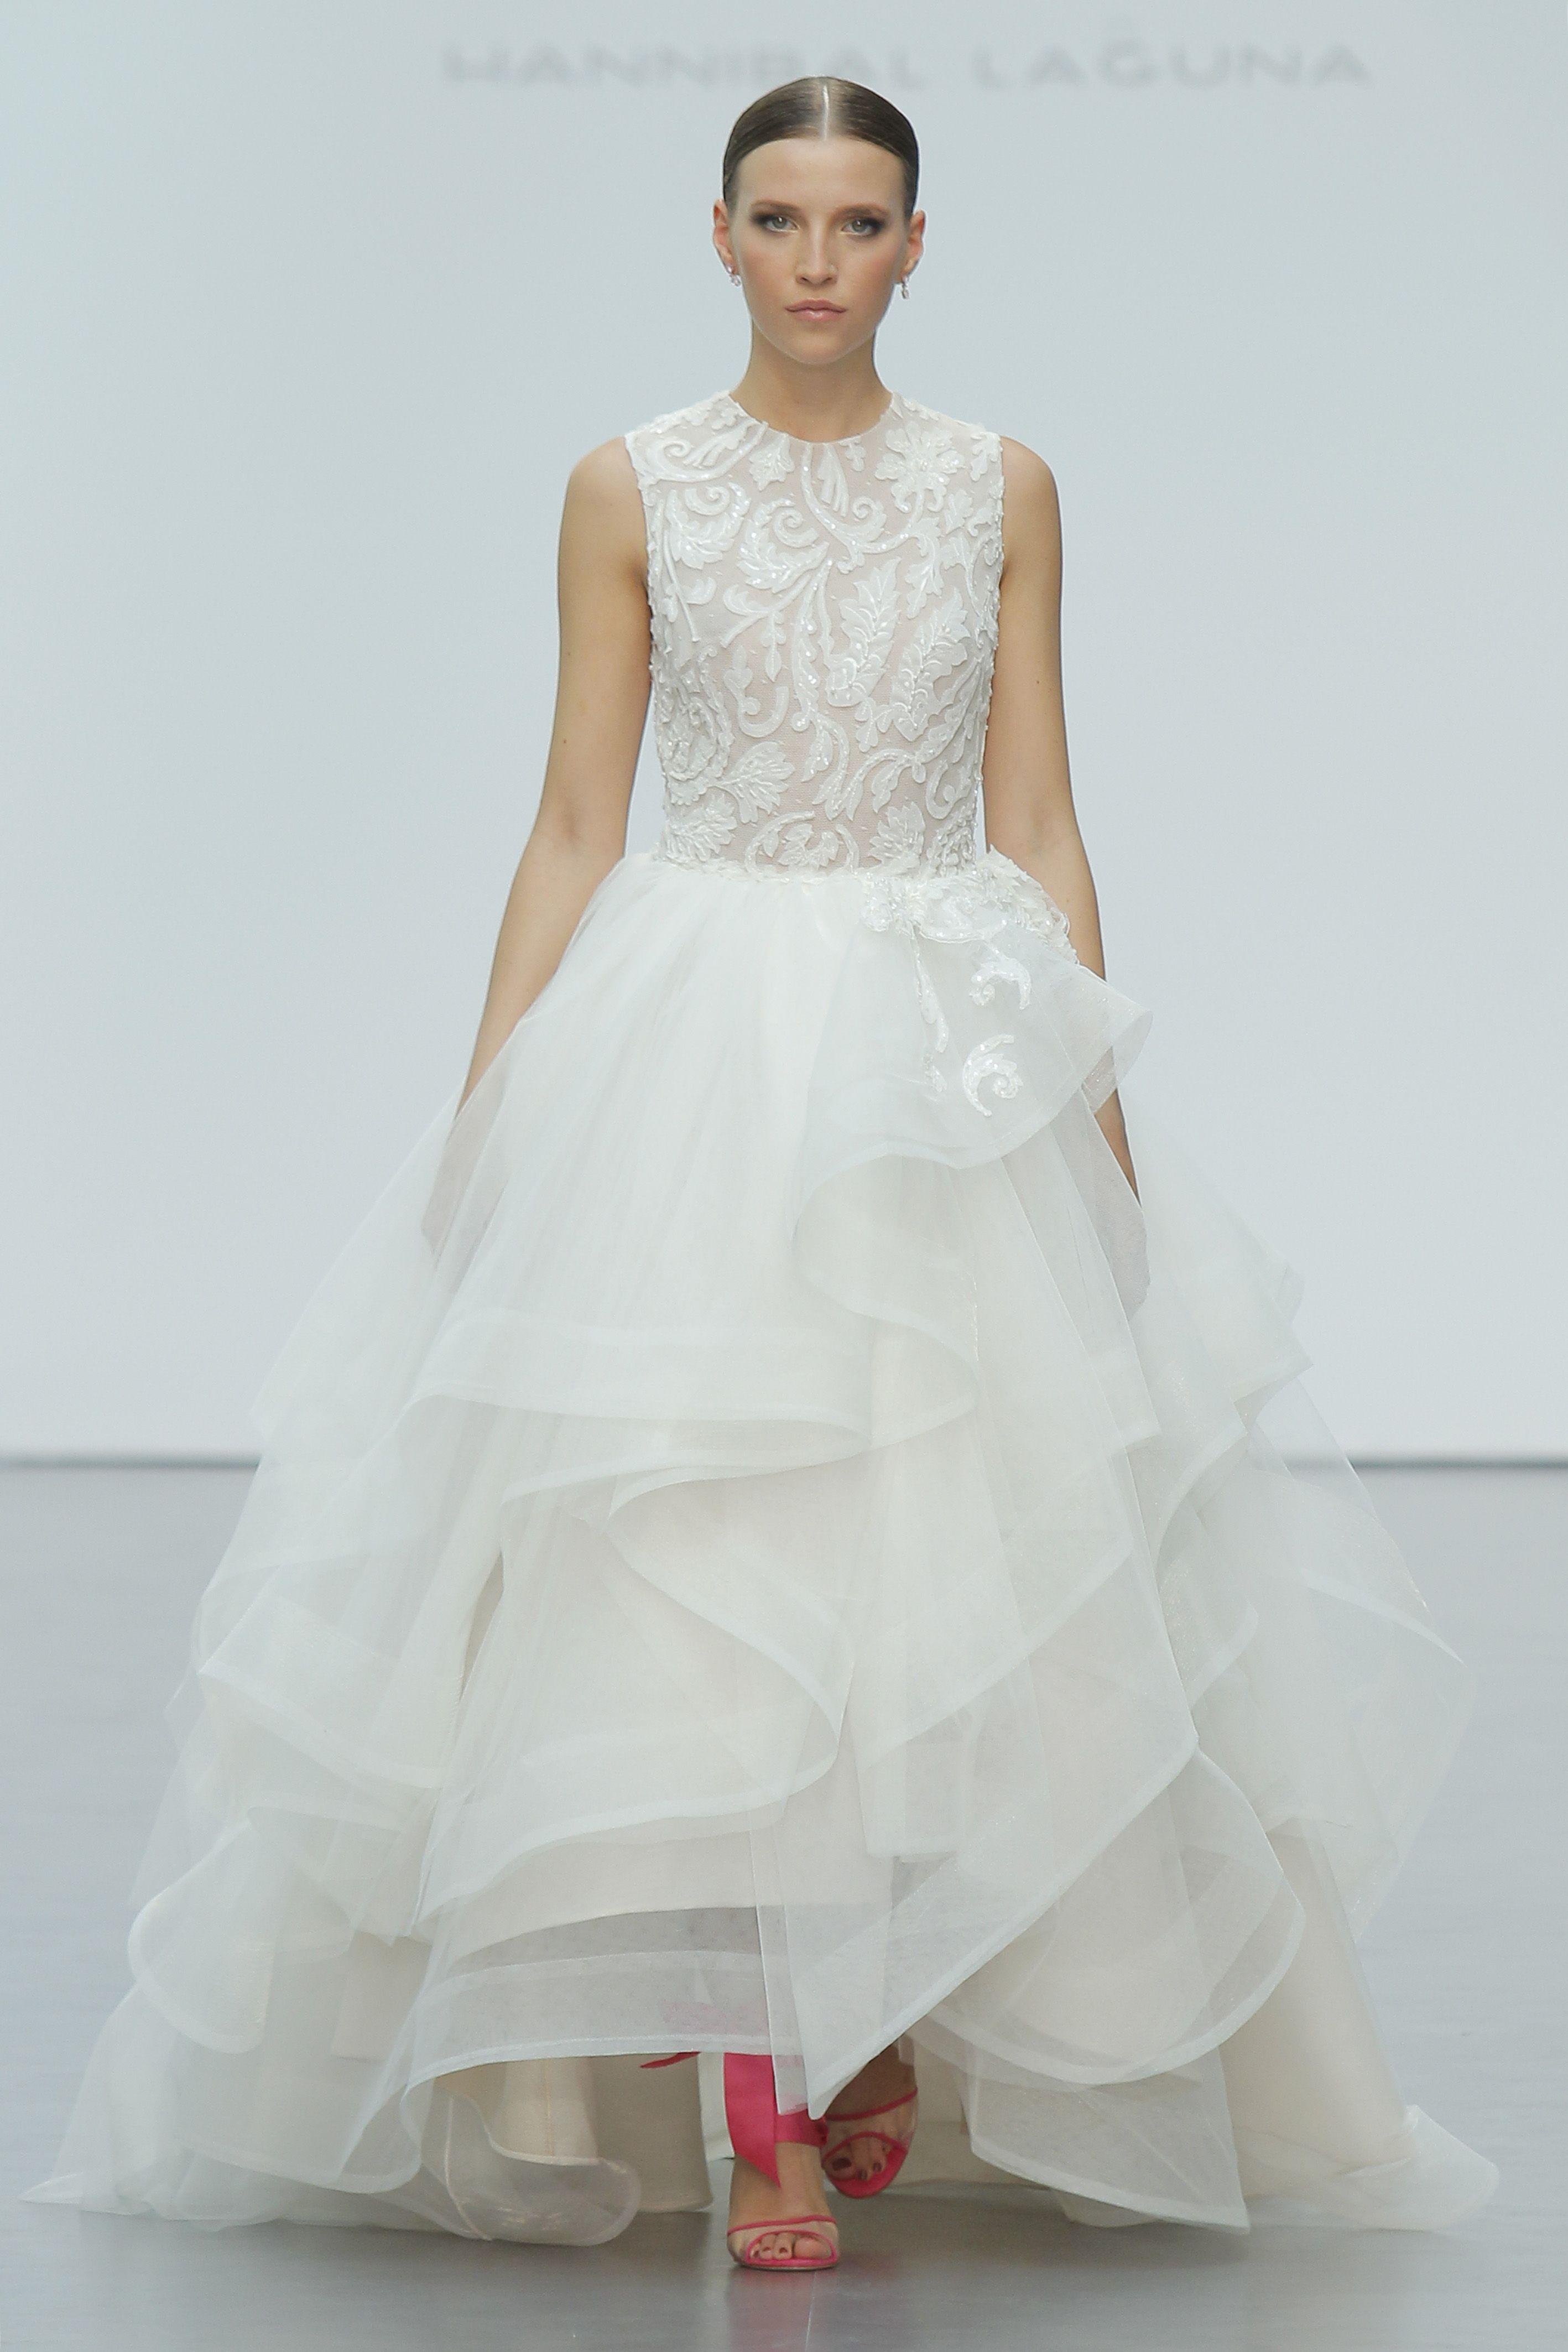 Hannibal Laguna inaugura Pasarela Costura España - Madrid Bridal Week